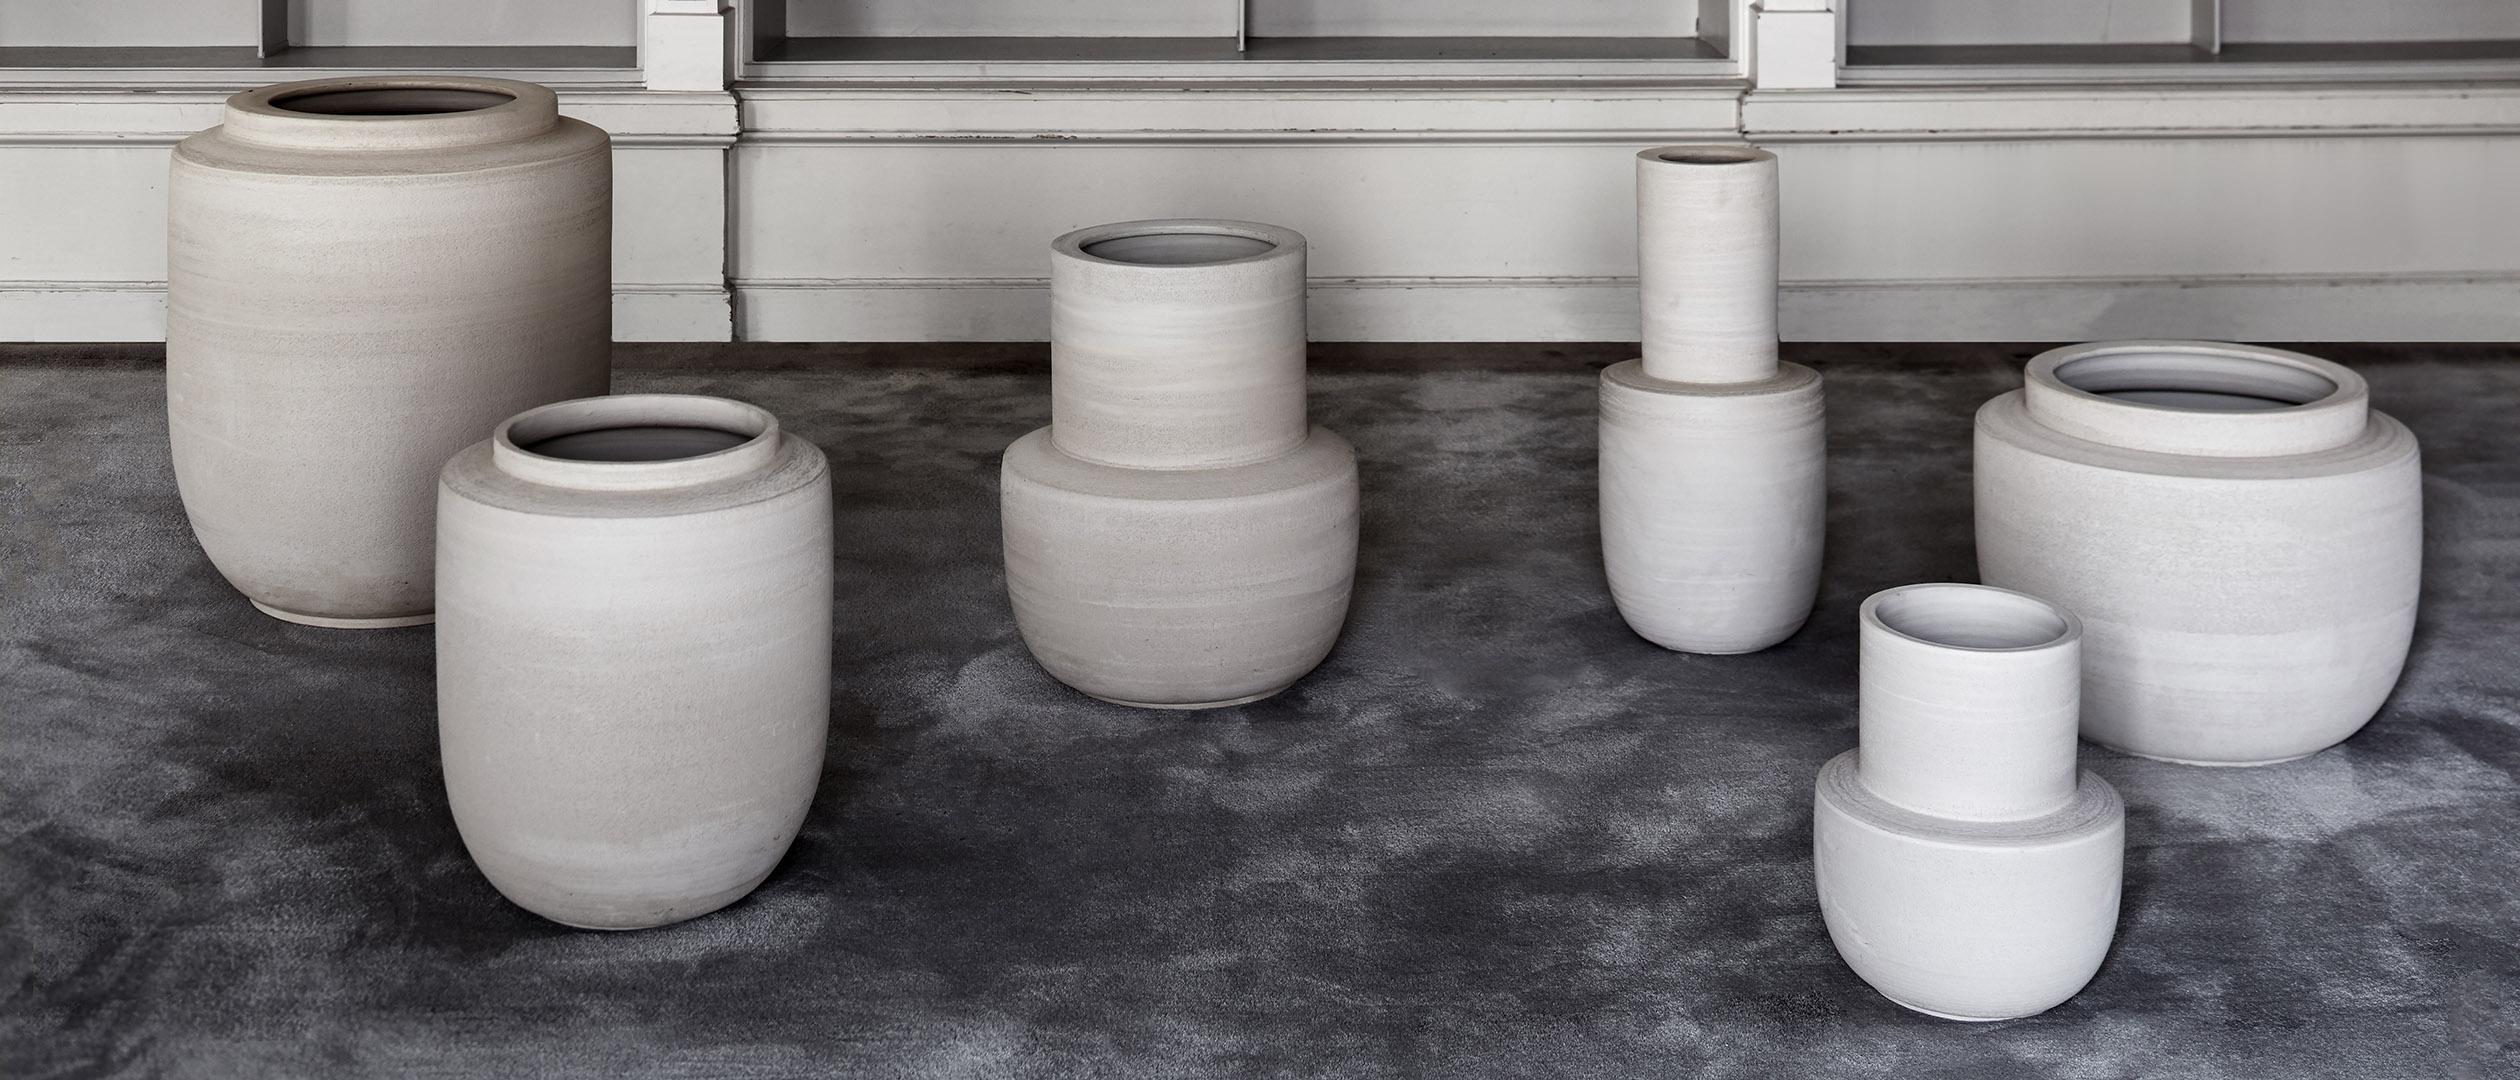 Piet Boon by Carpetlinq carpet